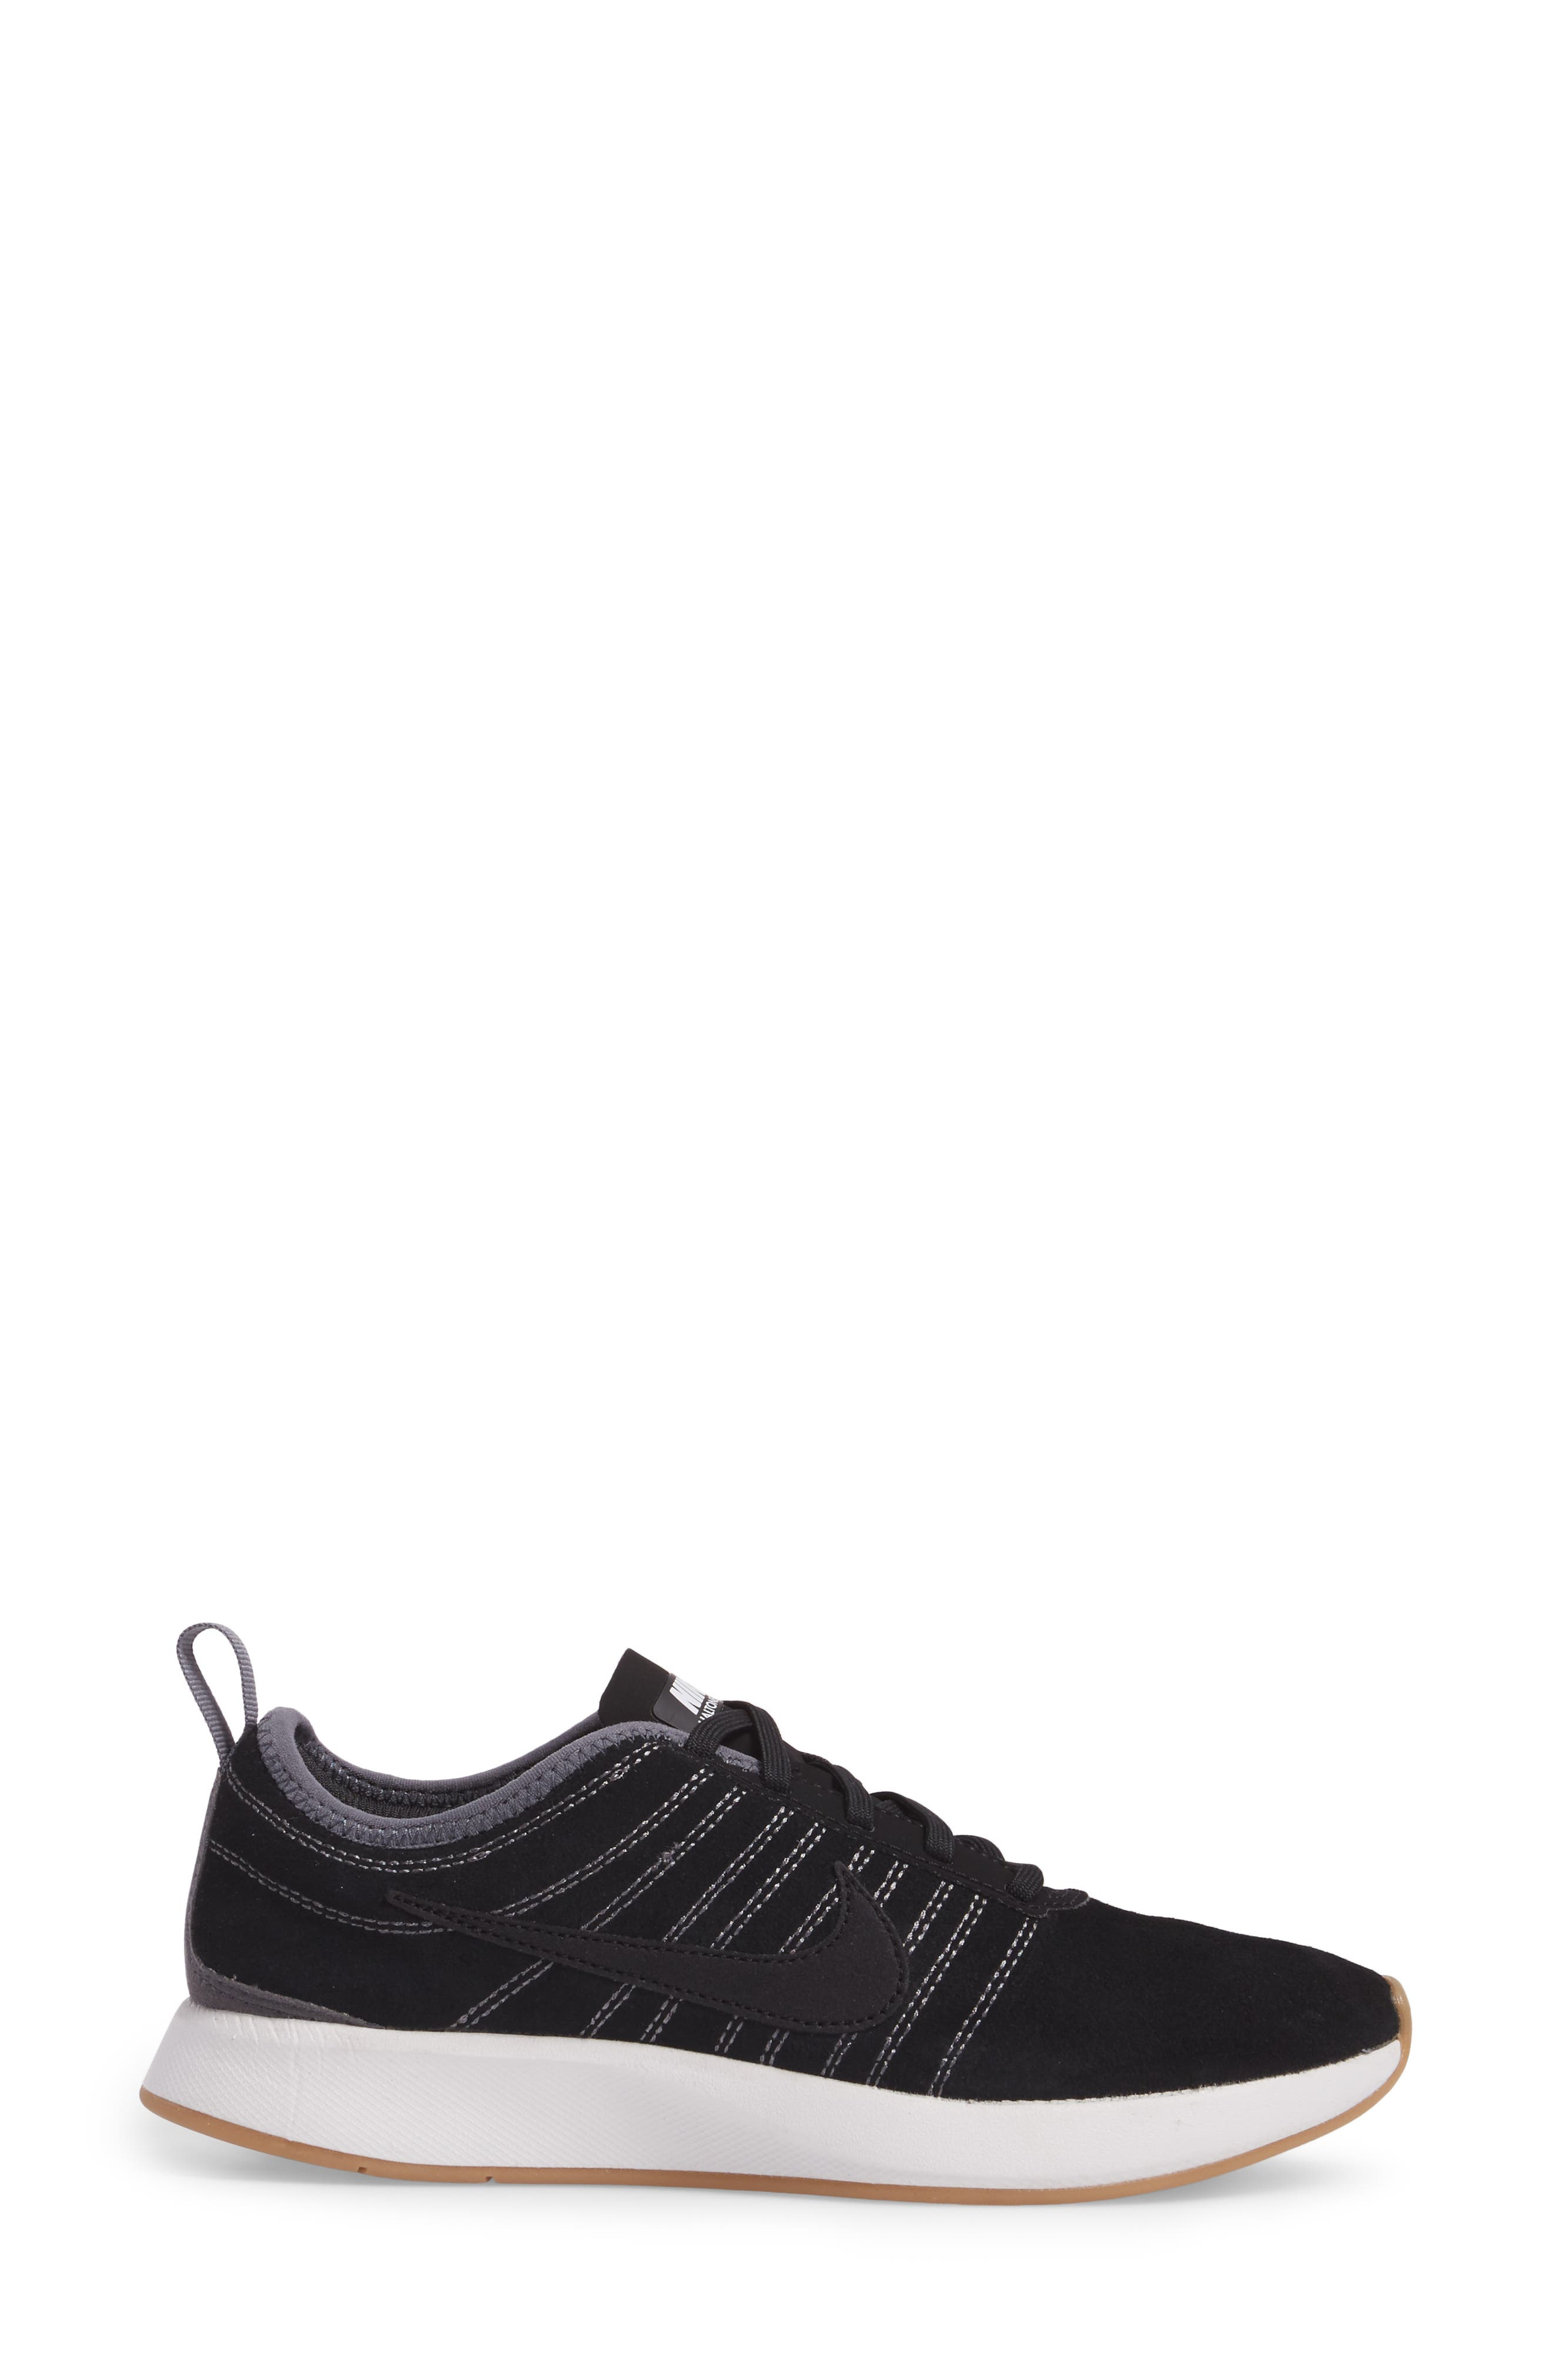 Alternate Image 3  - Nike Dualtone Racer SE Sneaker (Women)